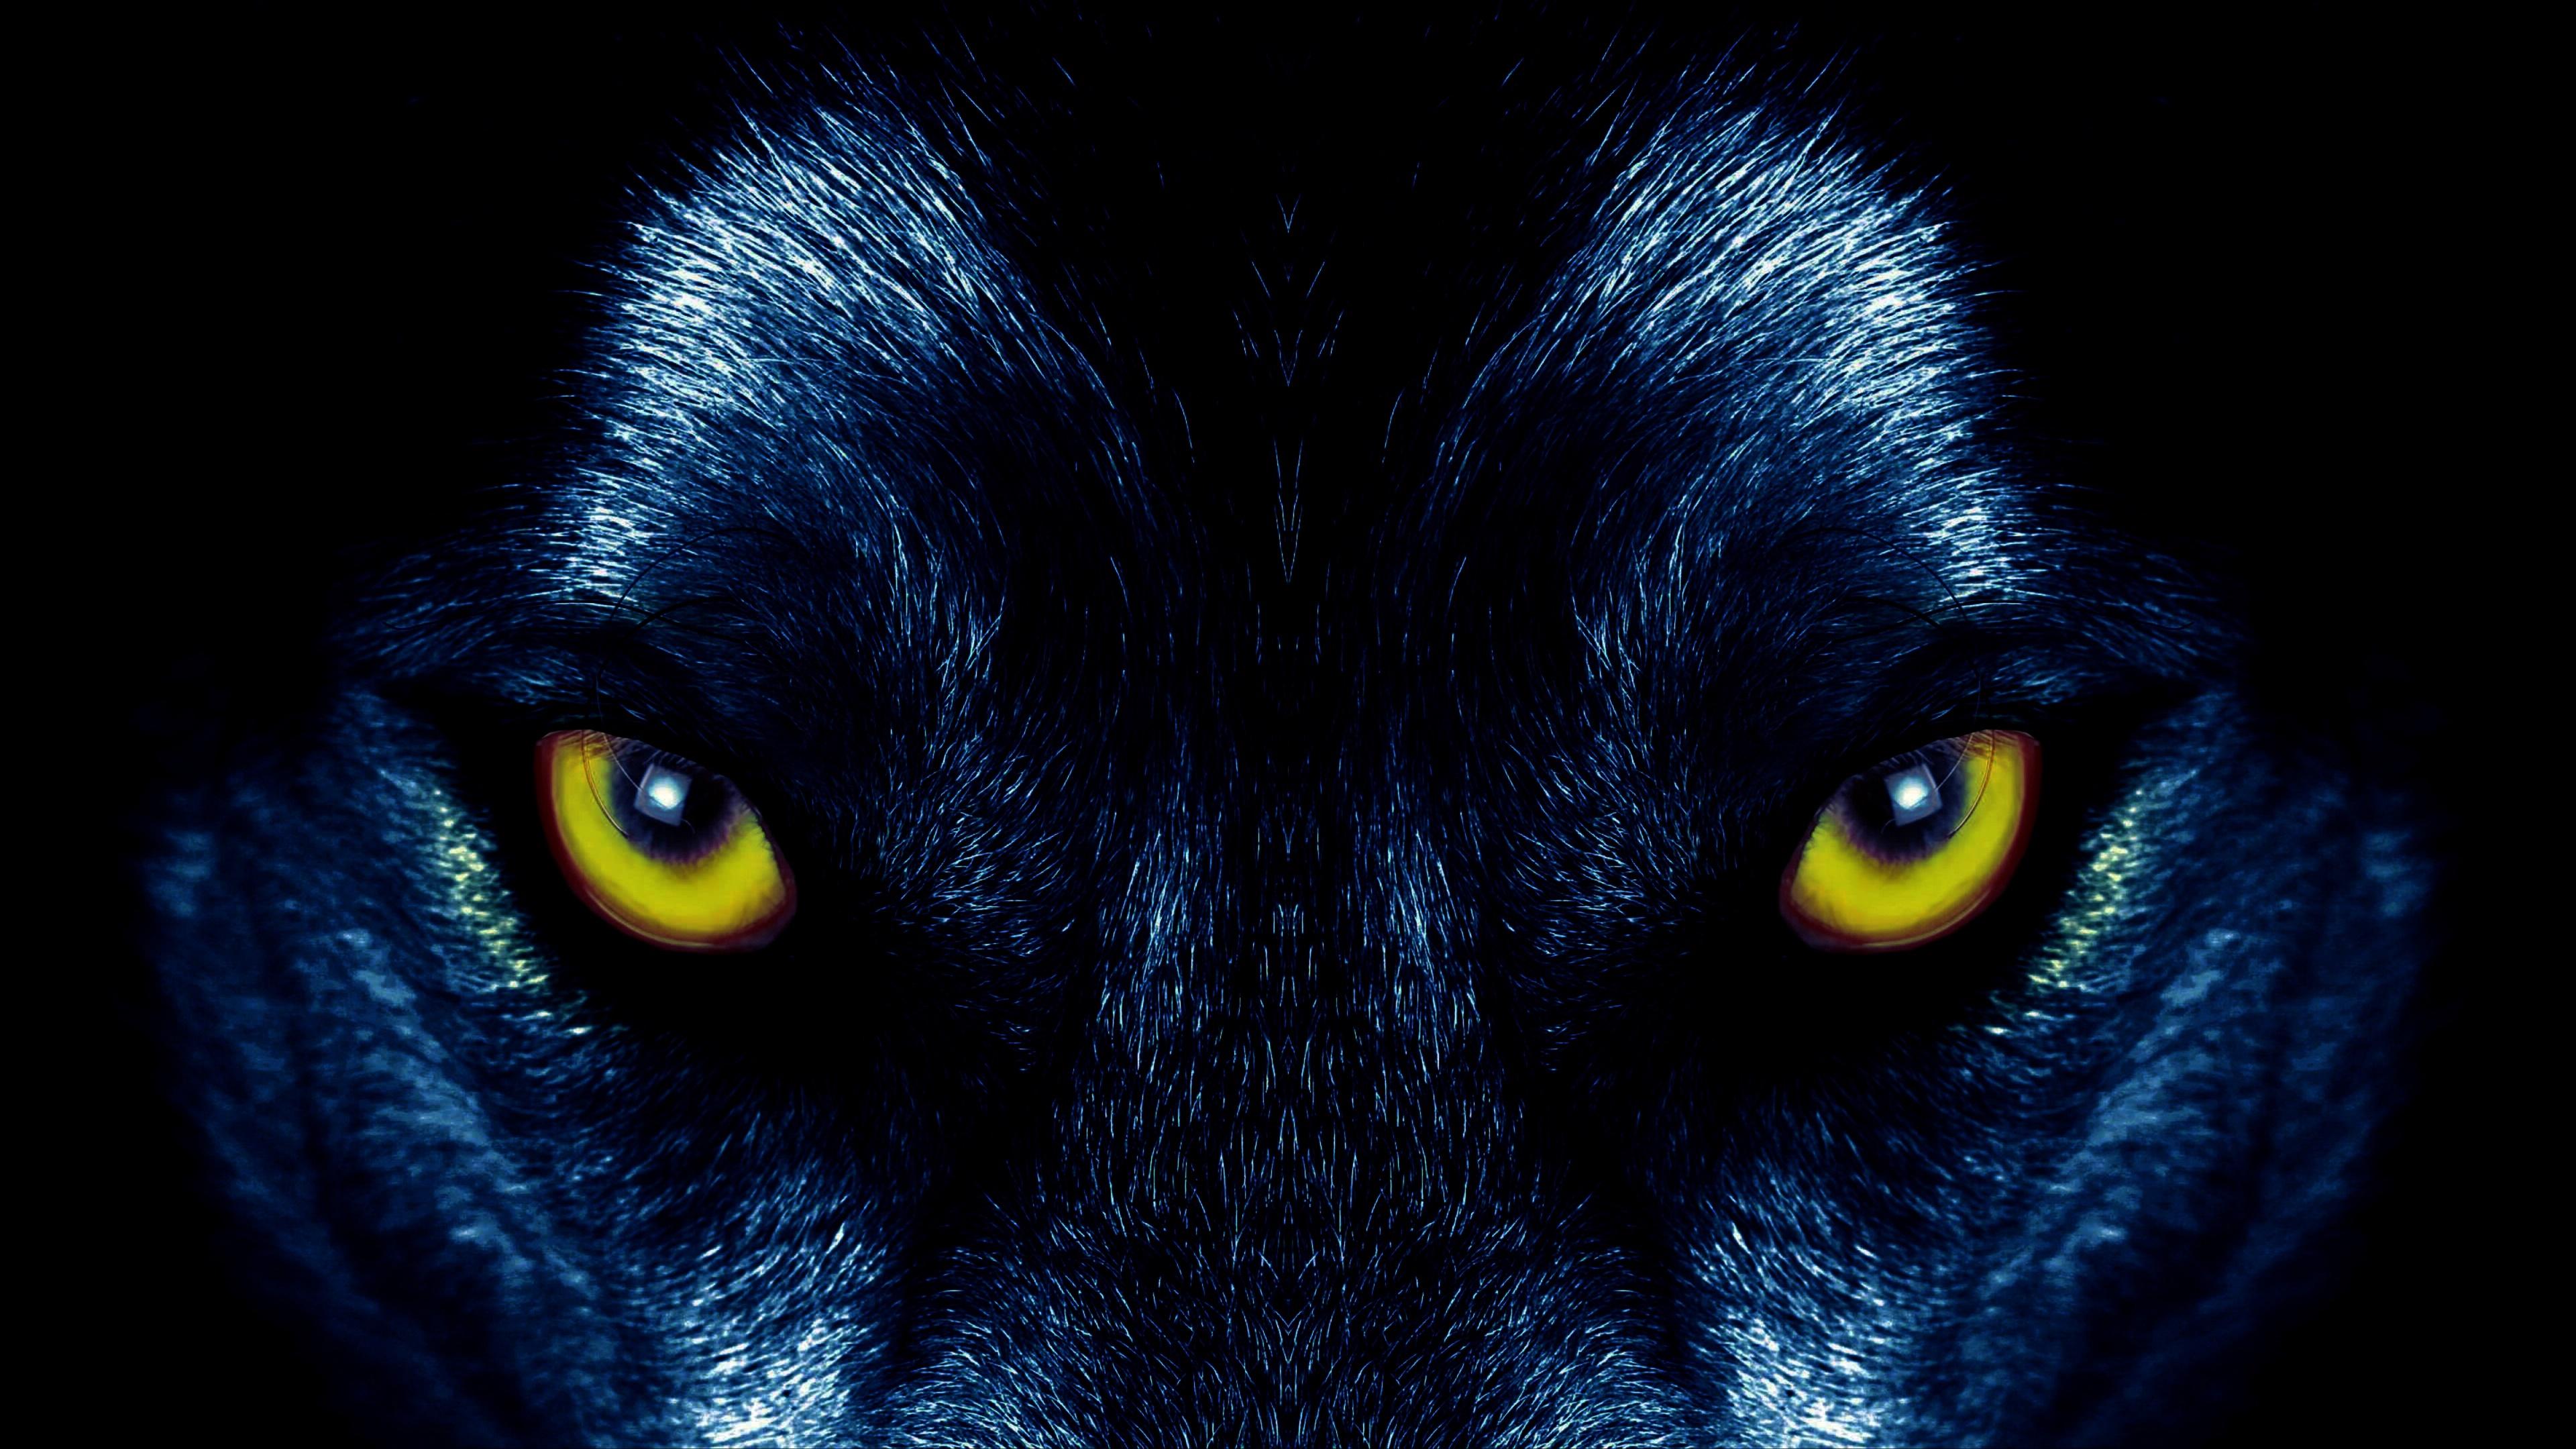 Wolf eyes wallpaper